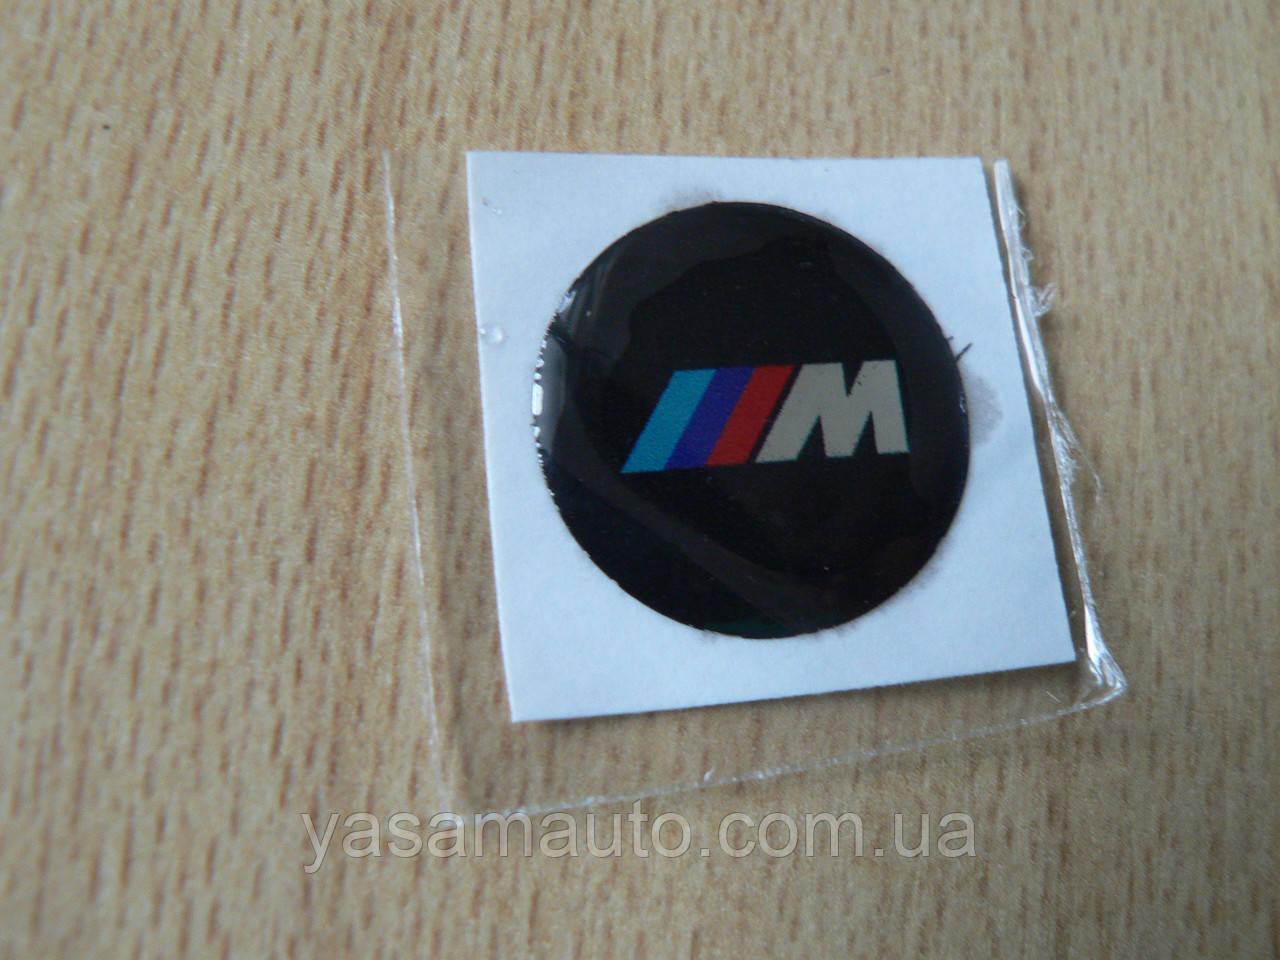 Наклейка s круглая BMW 3M 13х13х1.3мм черный без ободка силикон эмблема на авто ключи сигнализацию /// 3М БМВ